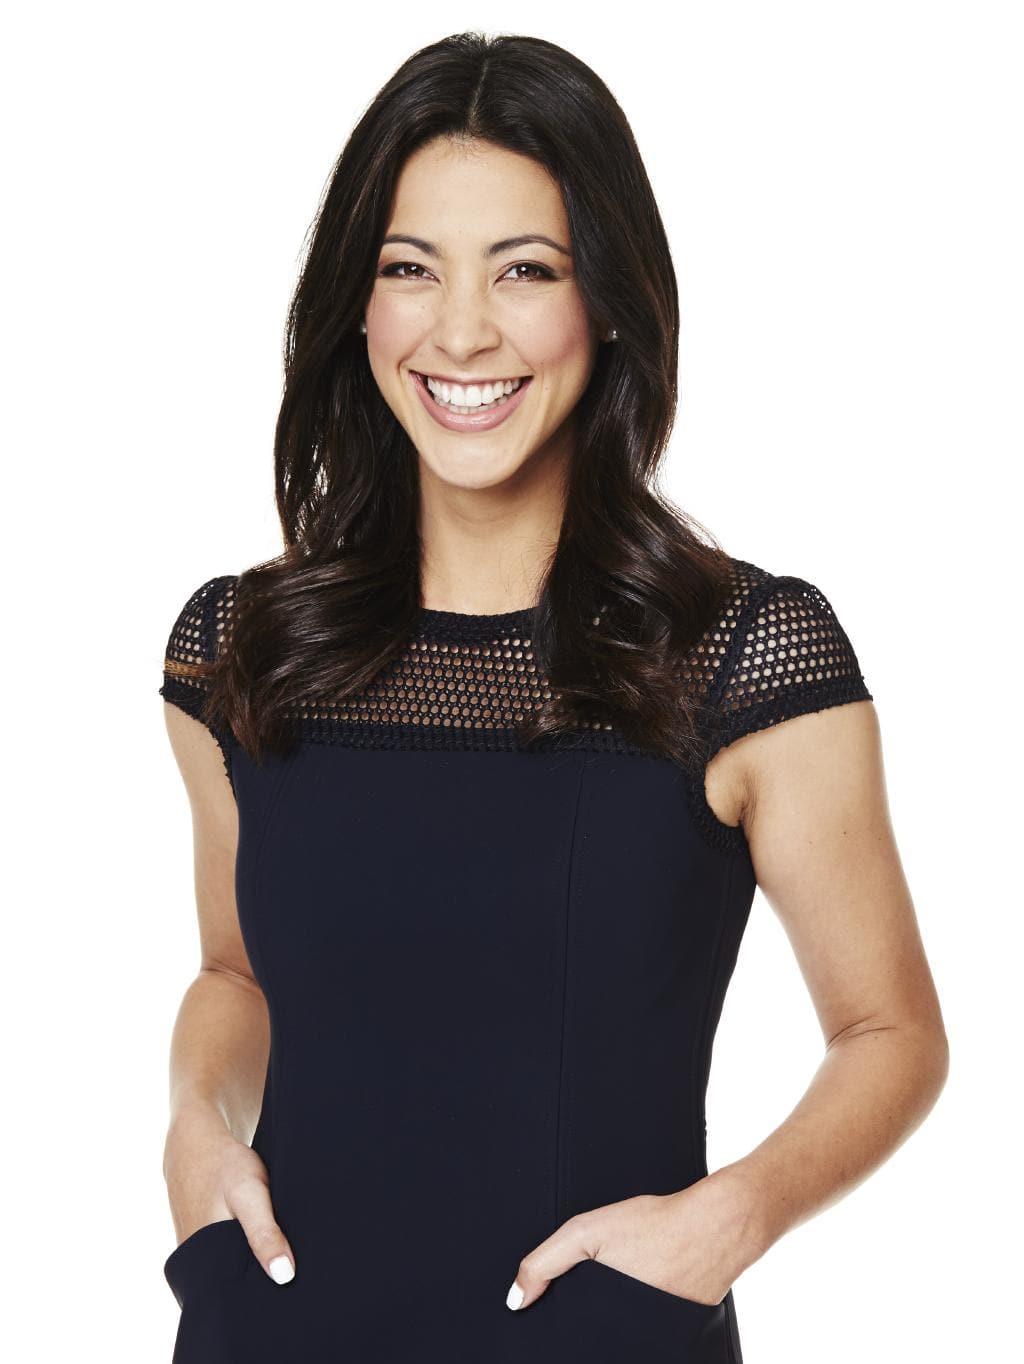 Tara Rushton